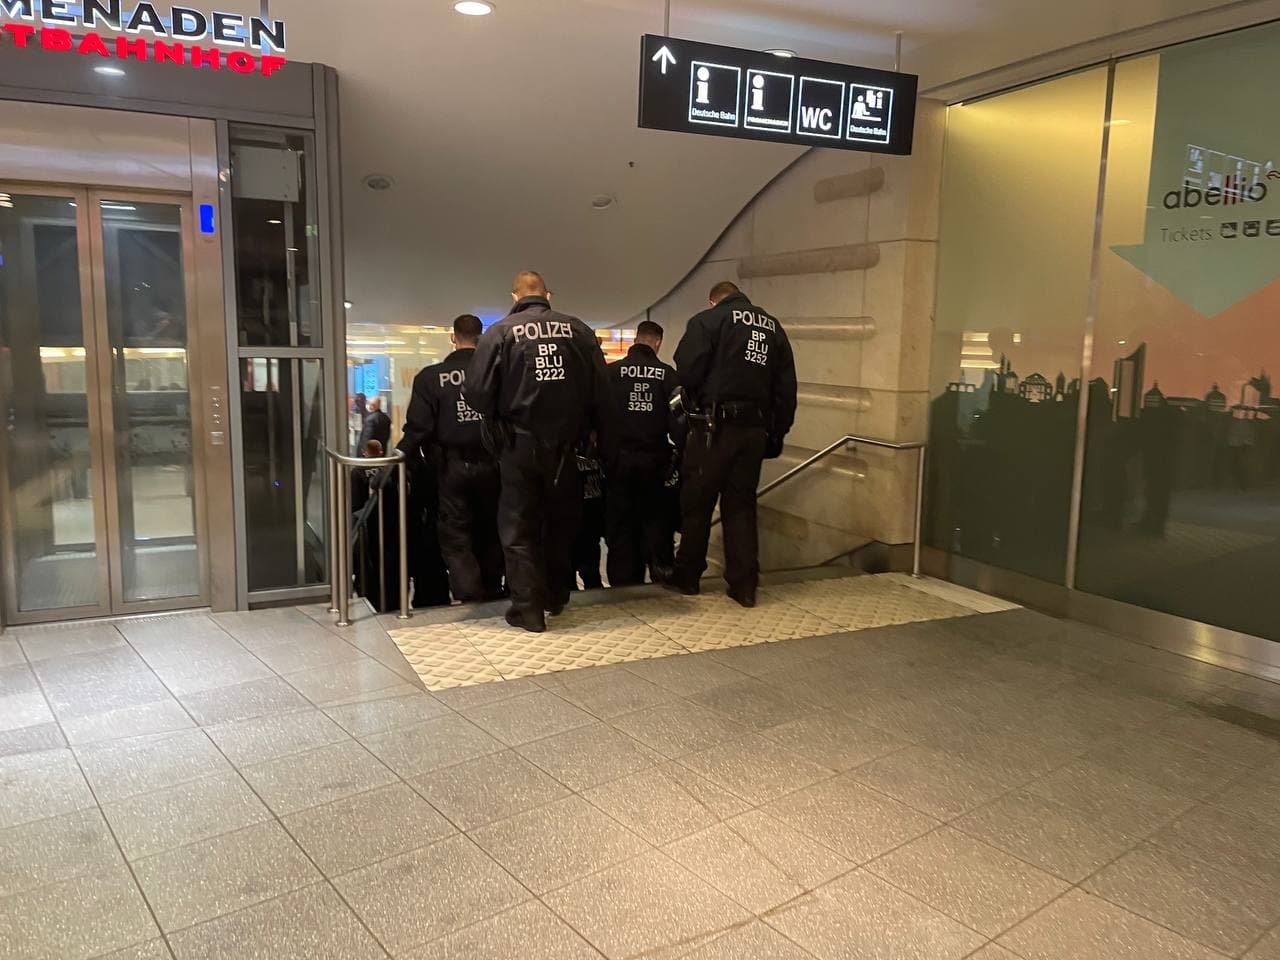 Einsatzpolizei bereits am Bahnhof. Foto: LZ